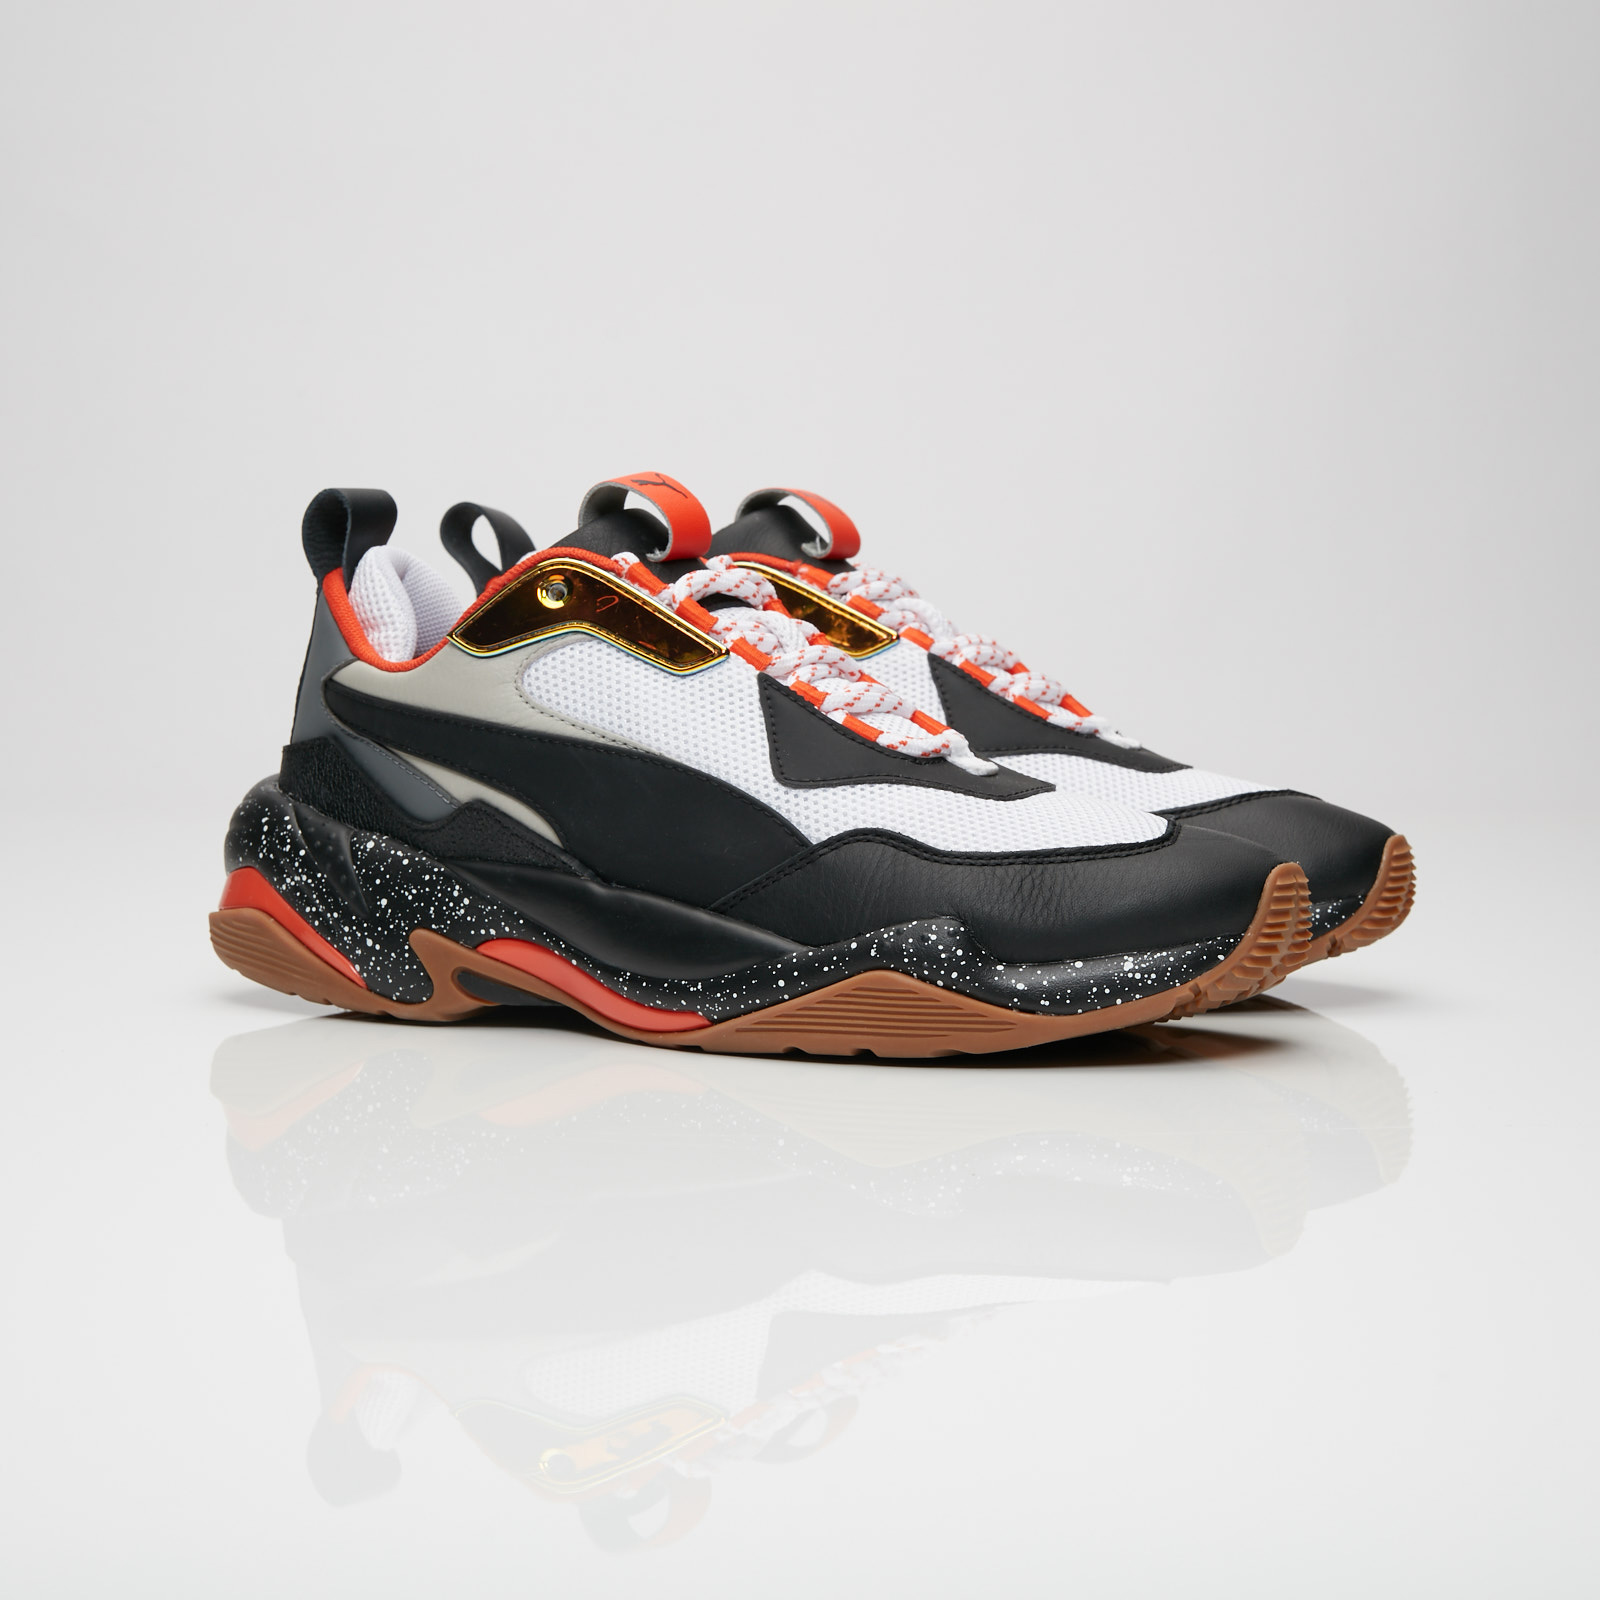 Puma Thunder Electric - 367996-01 - Sneakersnstuff  59138a32e